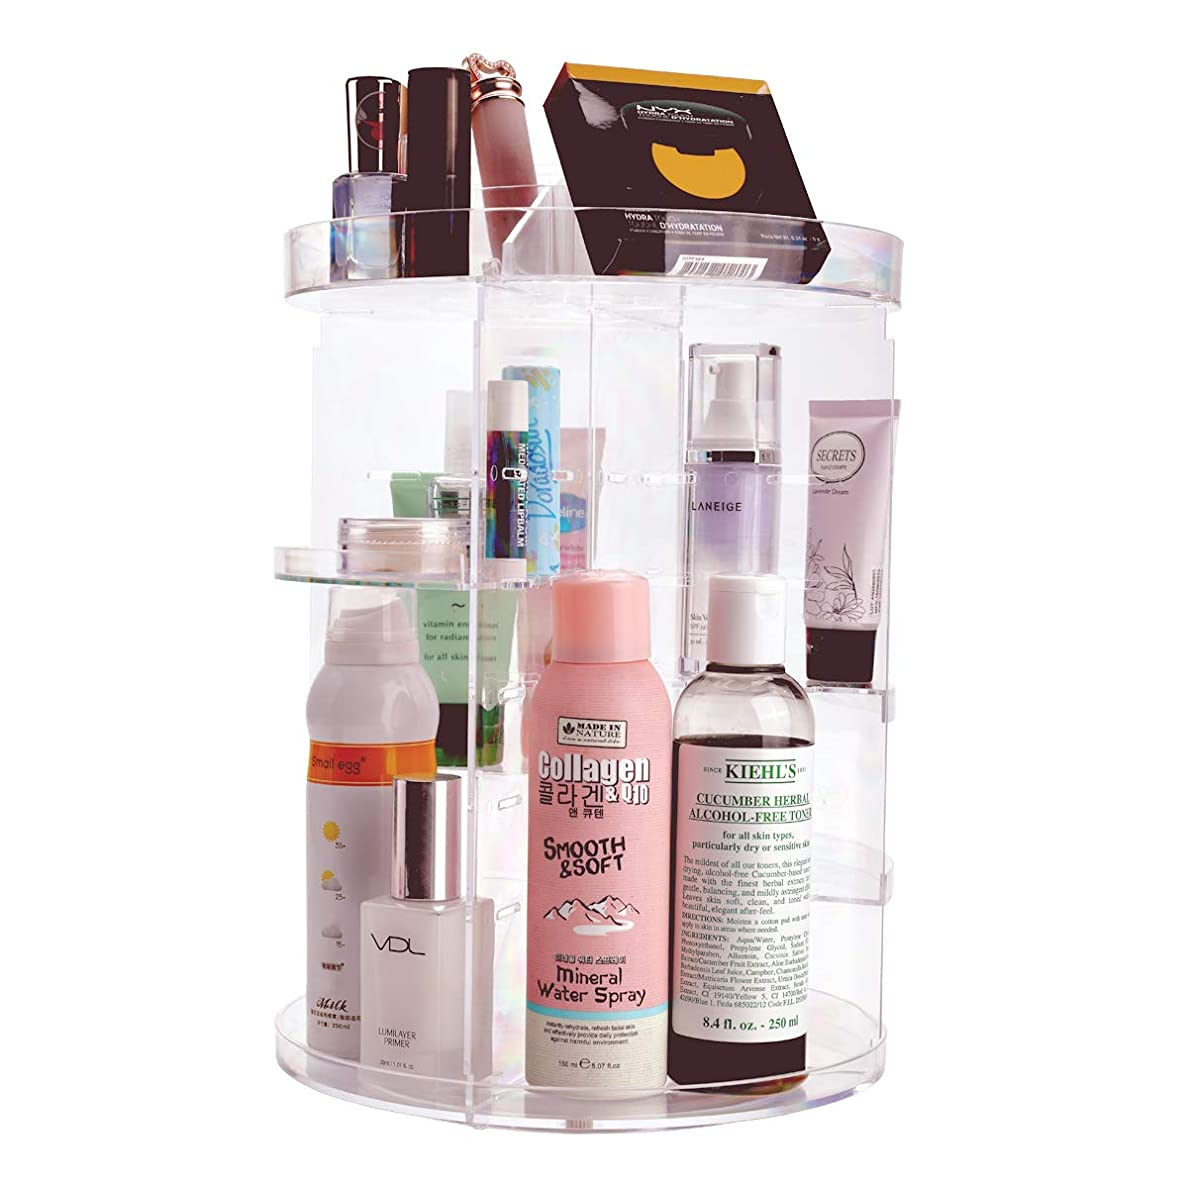 NKTM 化粧品収納ボックス コスメ収納 360度回転式 騒音なし 防塵 高透明度 強い耐久性 整理簡単 ギフト